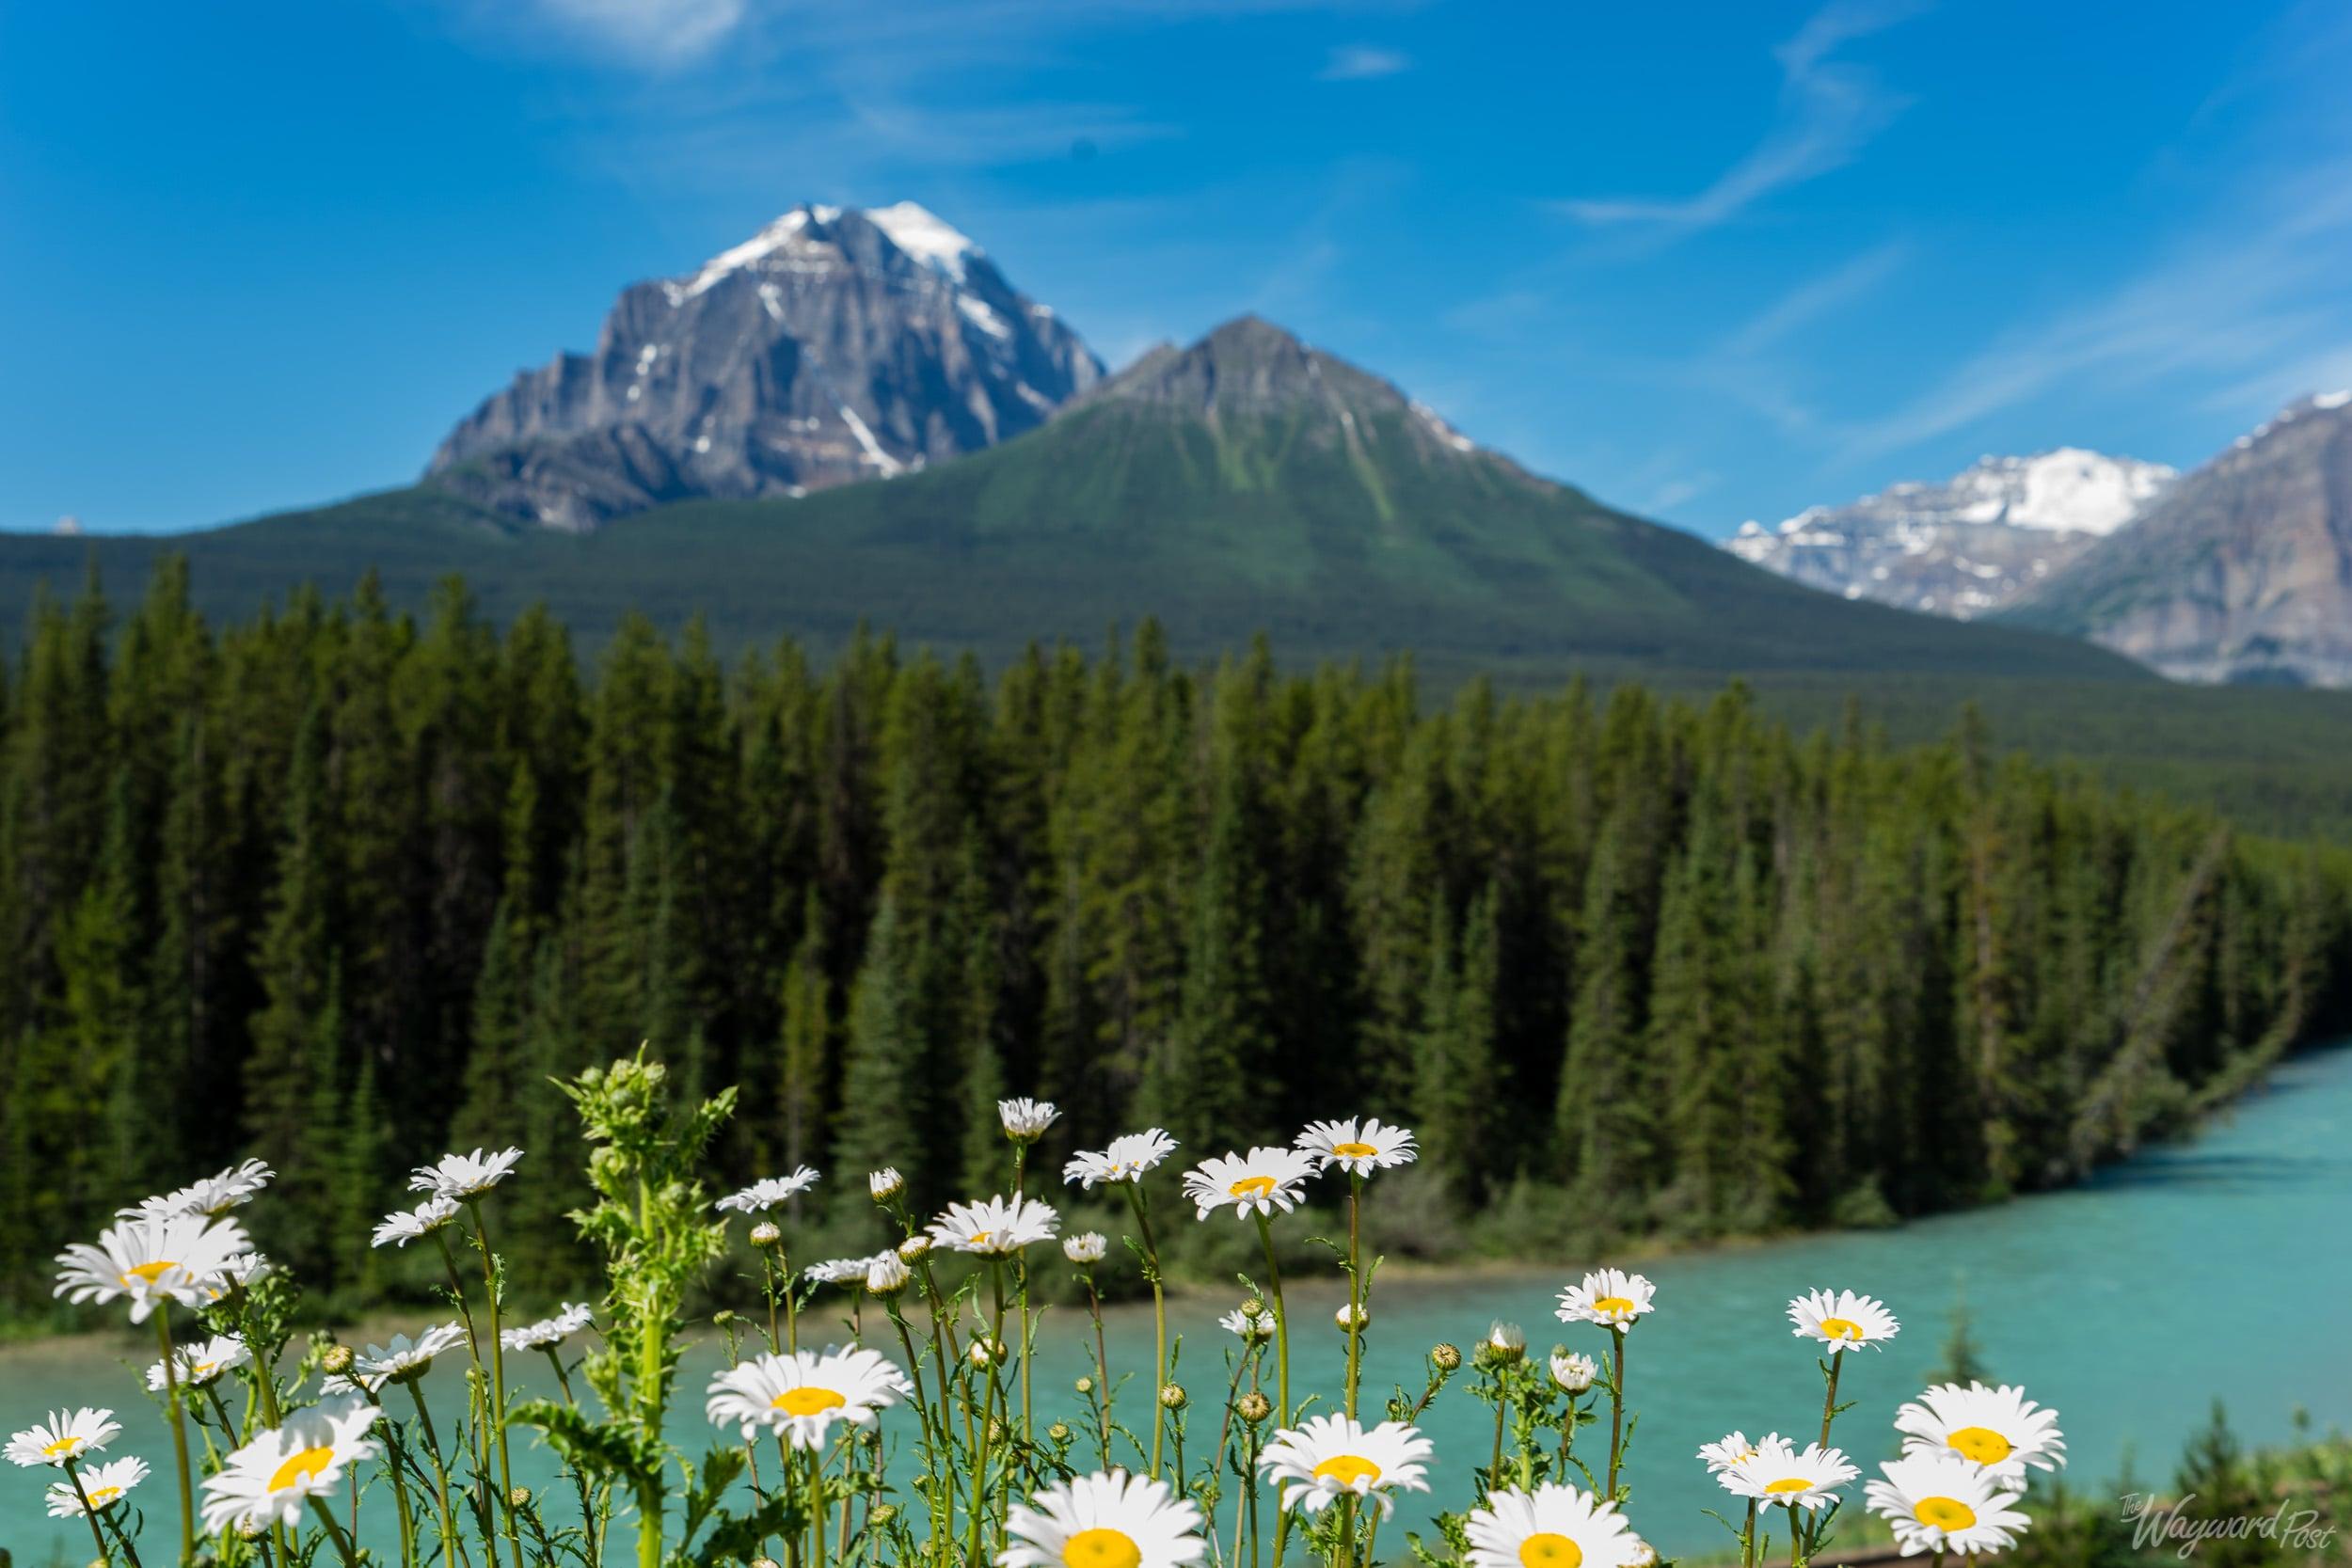 Bow River Summer Flowers -The Wayward Post - Photo Story - Banff National Park.